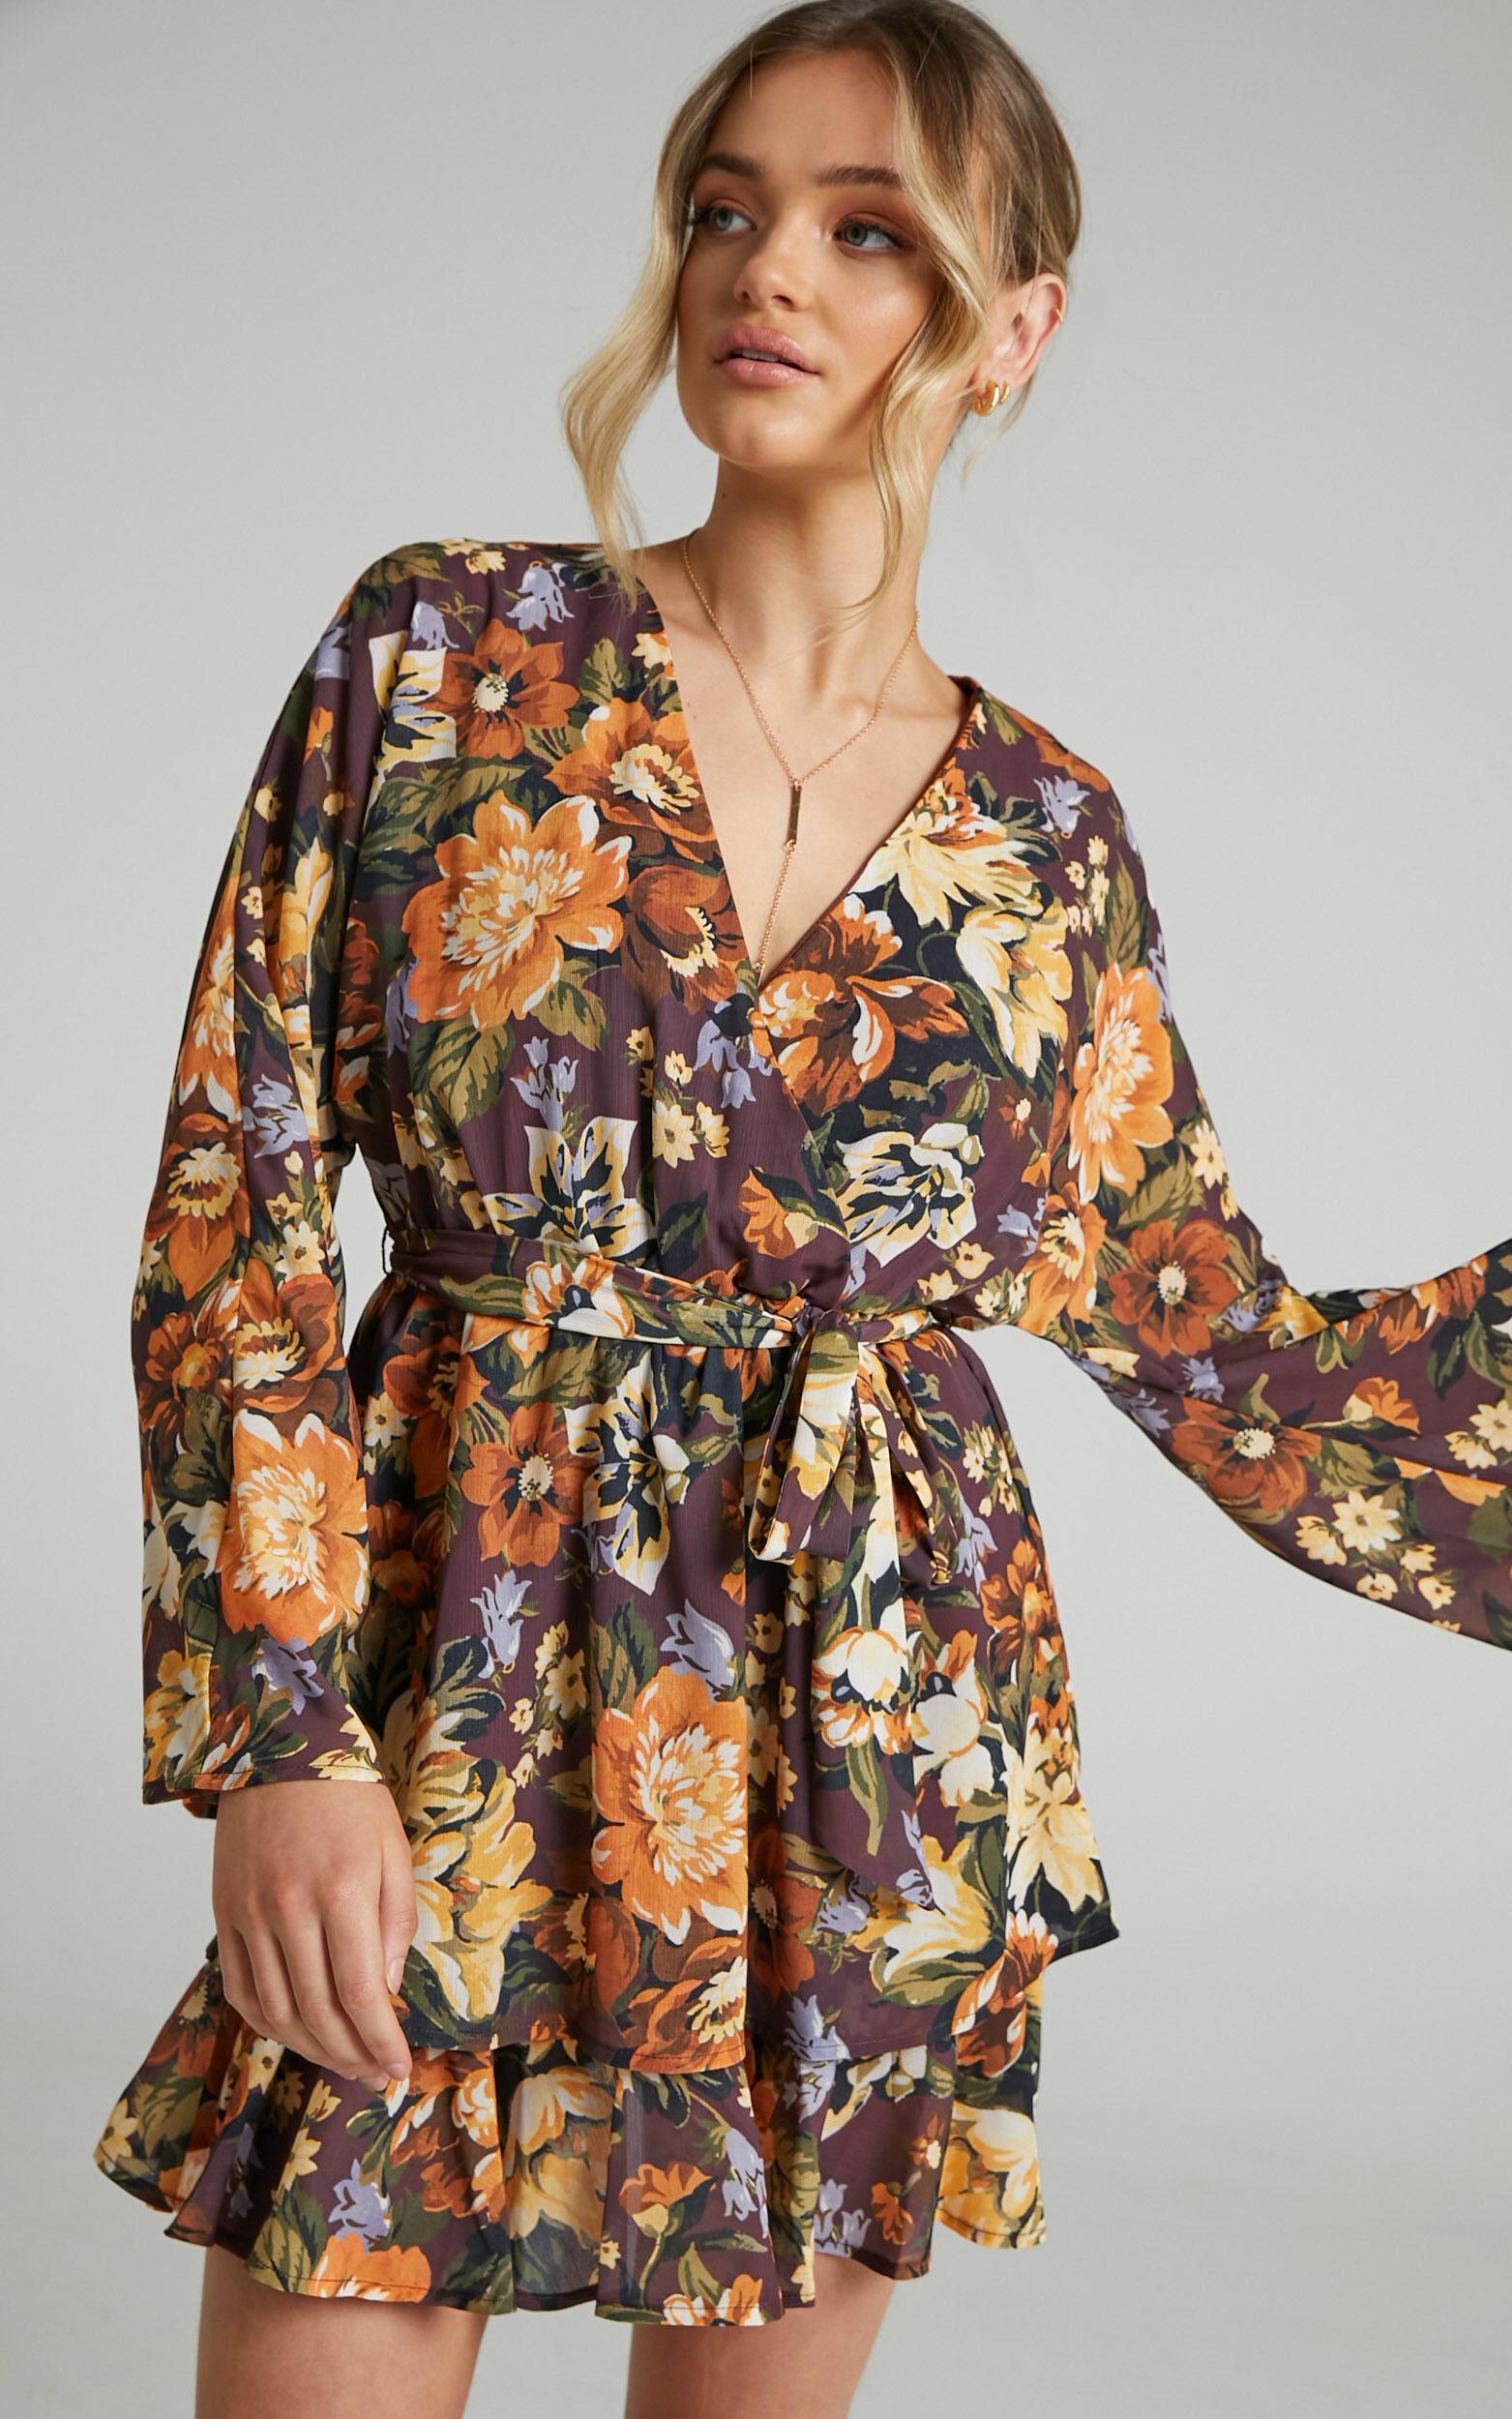 Alisia Printed Tiered skirt Mini Dress in Indulgent Bloom - 06, BRN1, super-hi-res image number null